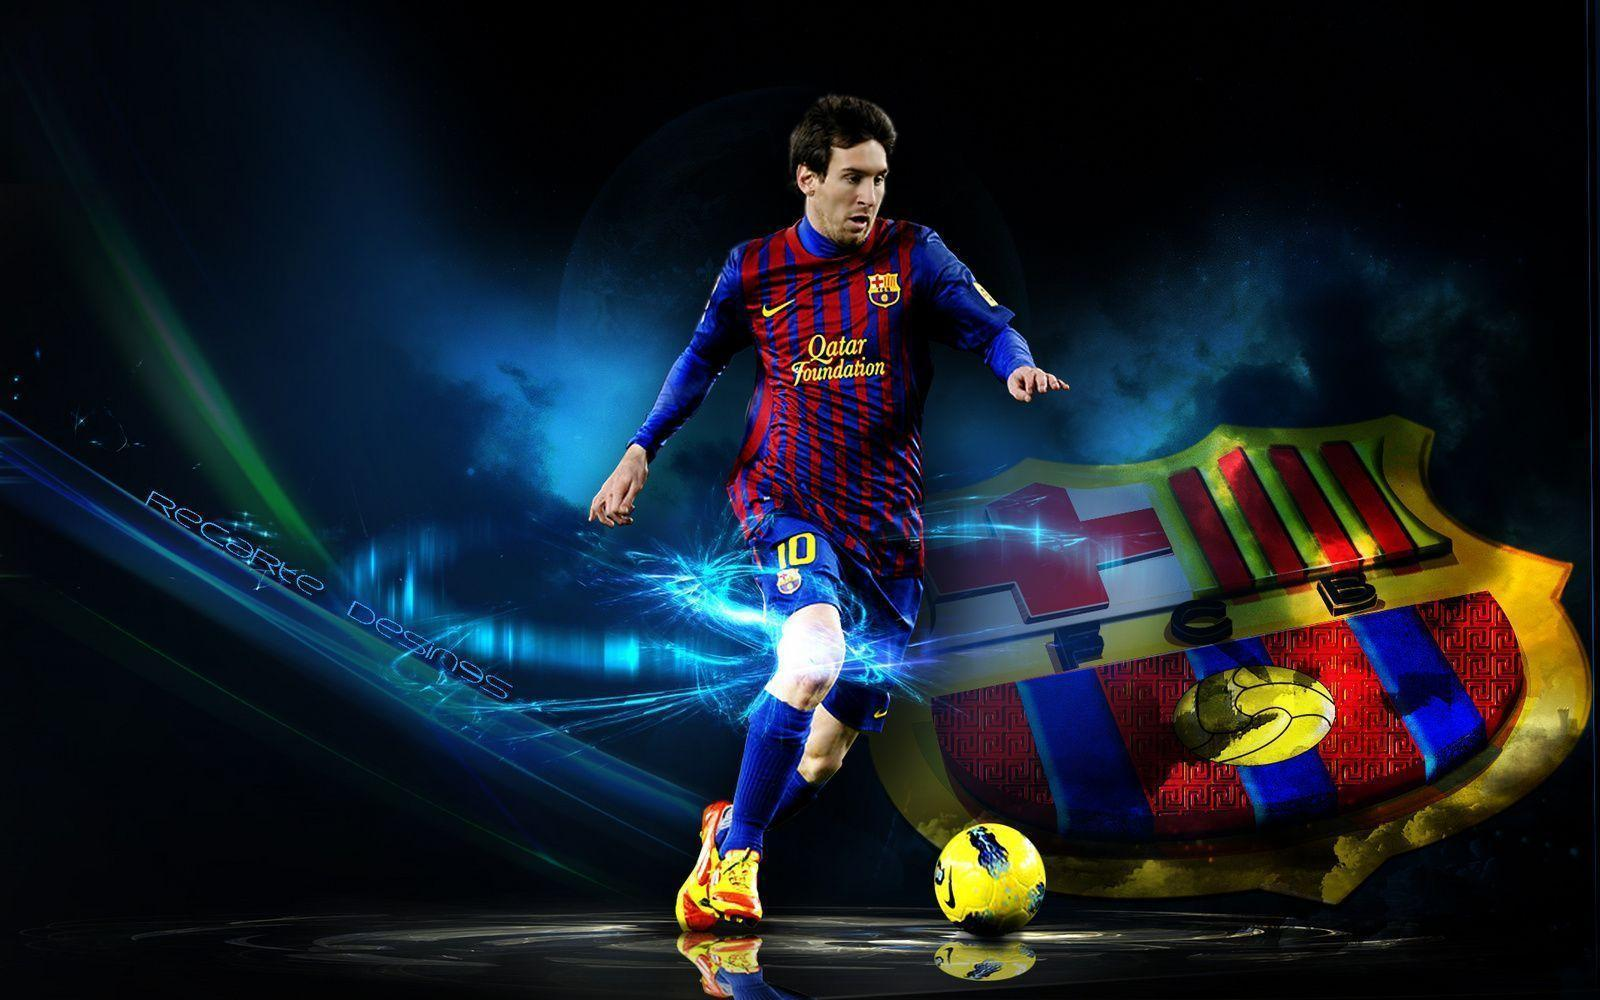 Messi Hd Wallpapers P  Wallpaper Cave